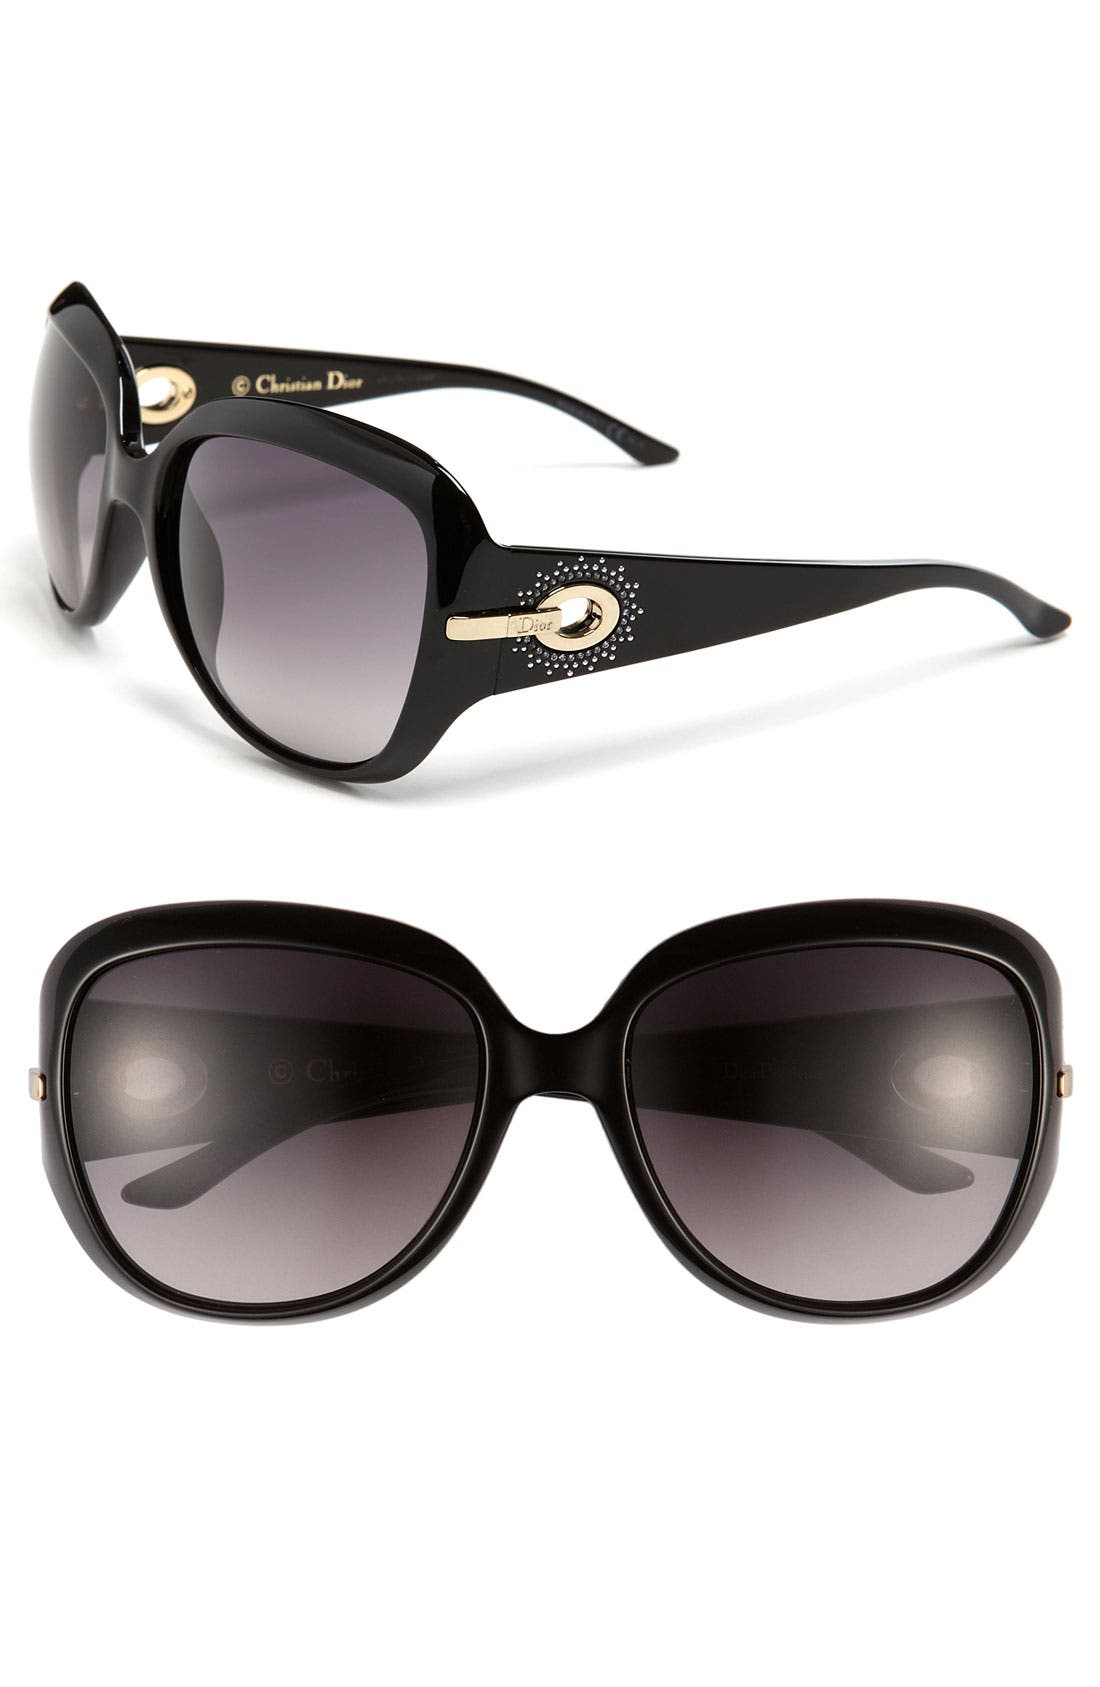 Main Image - Dior 57mm Oversized Sunglasses